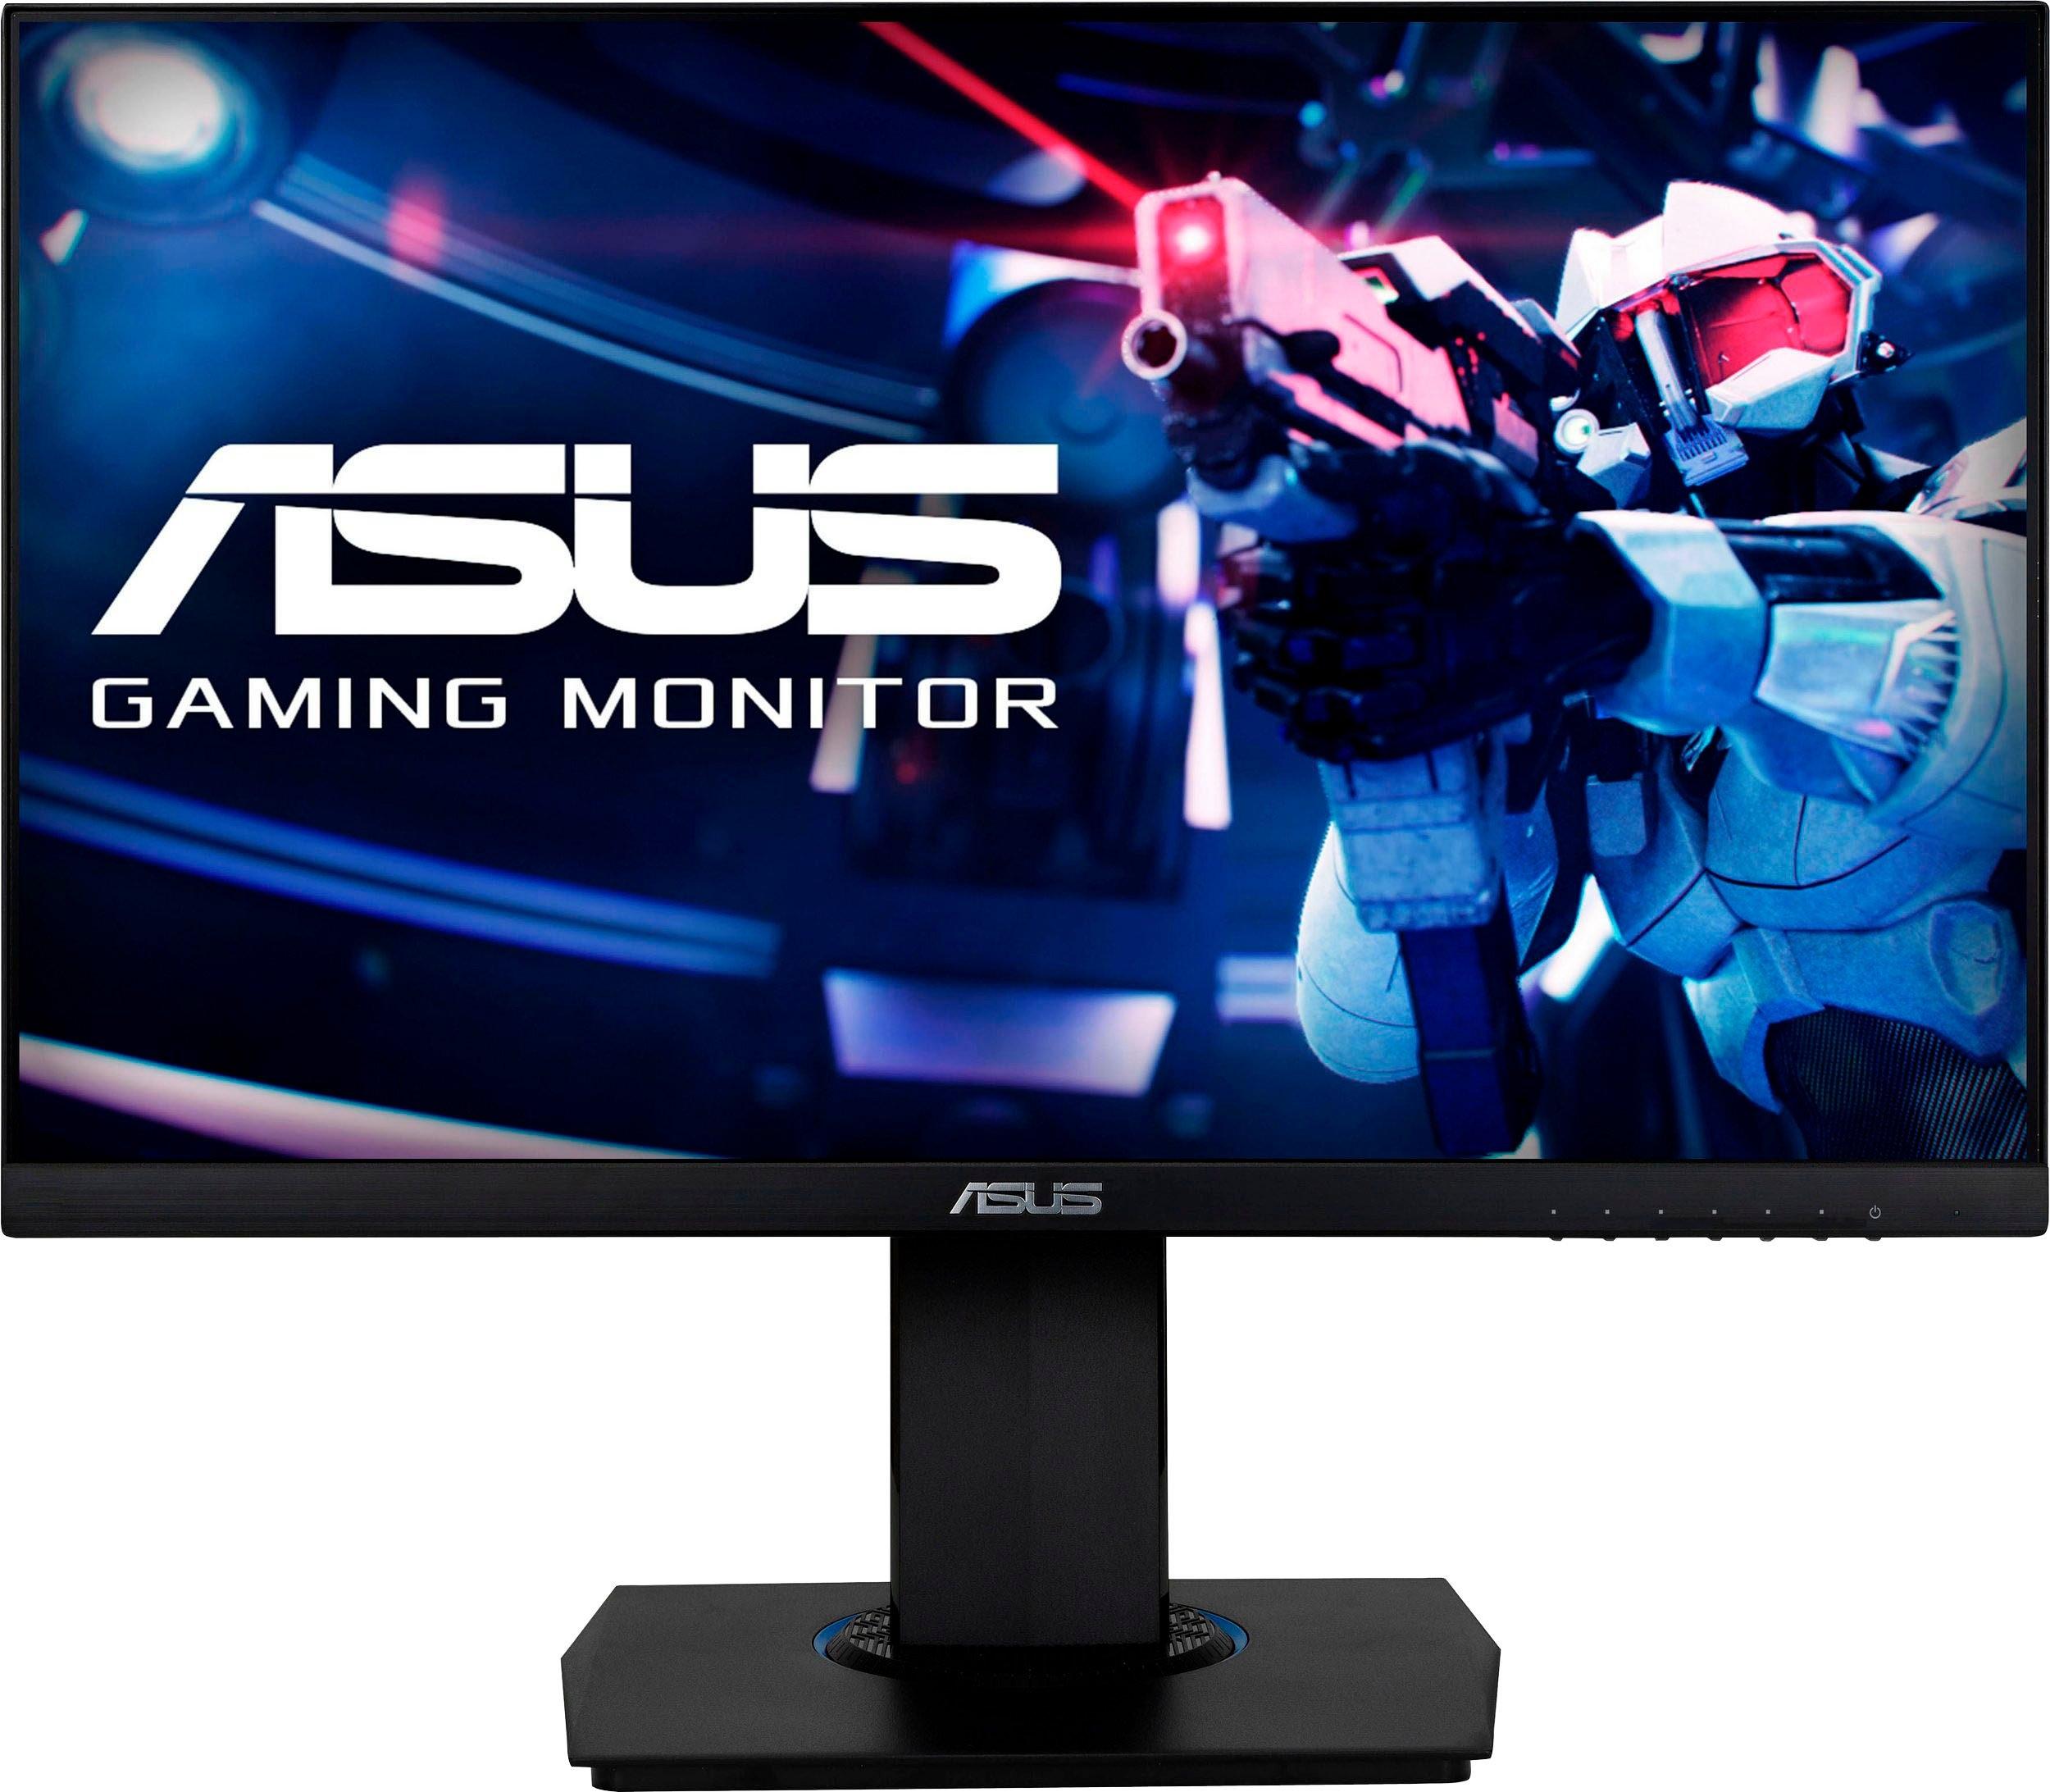 Asus gaming-monitor VG246H, 60,5 cm / 23,8